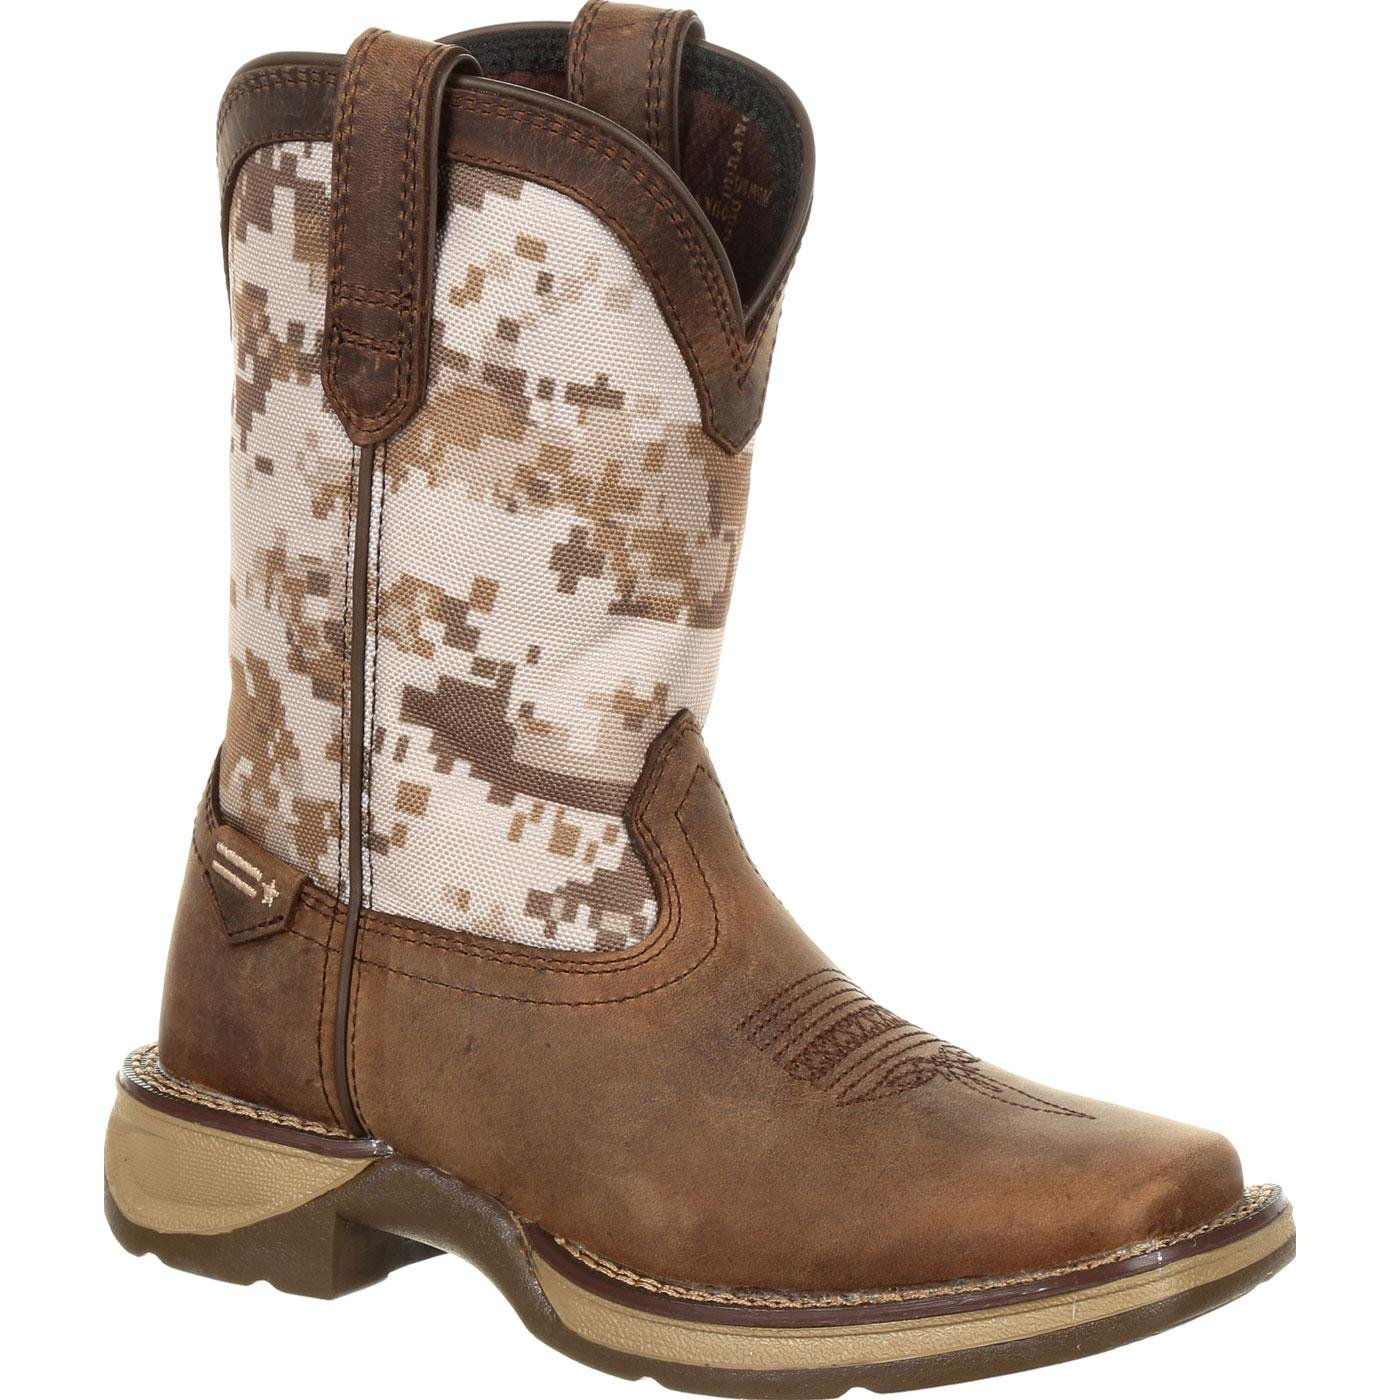 Durango Kid's Lil' Rebel Desert Camo Western Boots, Brown, Full-Grain Leather Vamp, Fiberglass, Mesh, Rubber, Nylon, 5 US Big Kid M